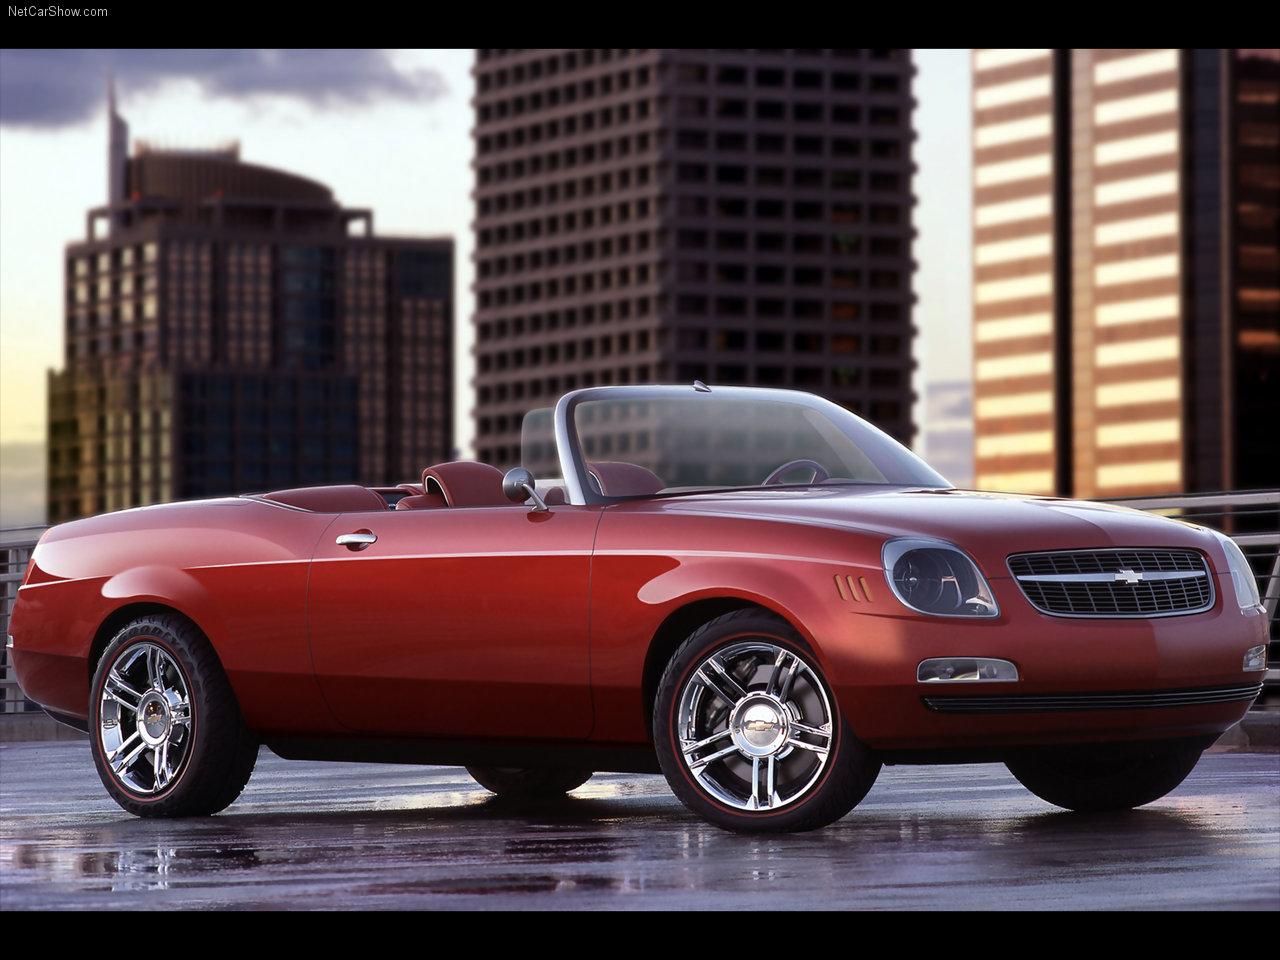 http://1.bp.blogspot.com/-88q4jf2i_3U/TYl-F4l-DHI/AAAAAAAAOCY/r0bxmu0hL7I/s1600/Chevrolet-Bel_Air_Concept_2002_1280x960_wallpaper_03.jpg